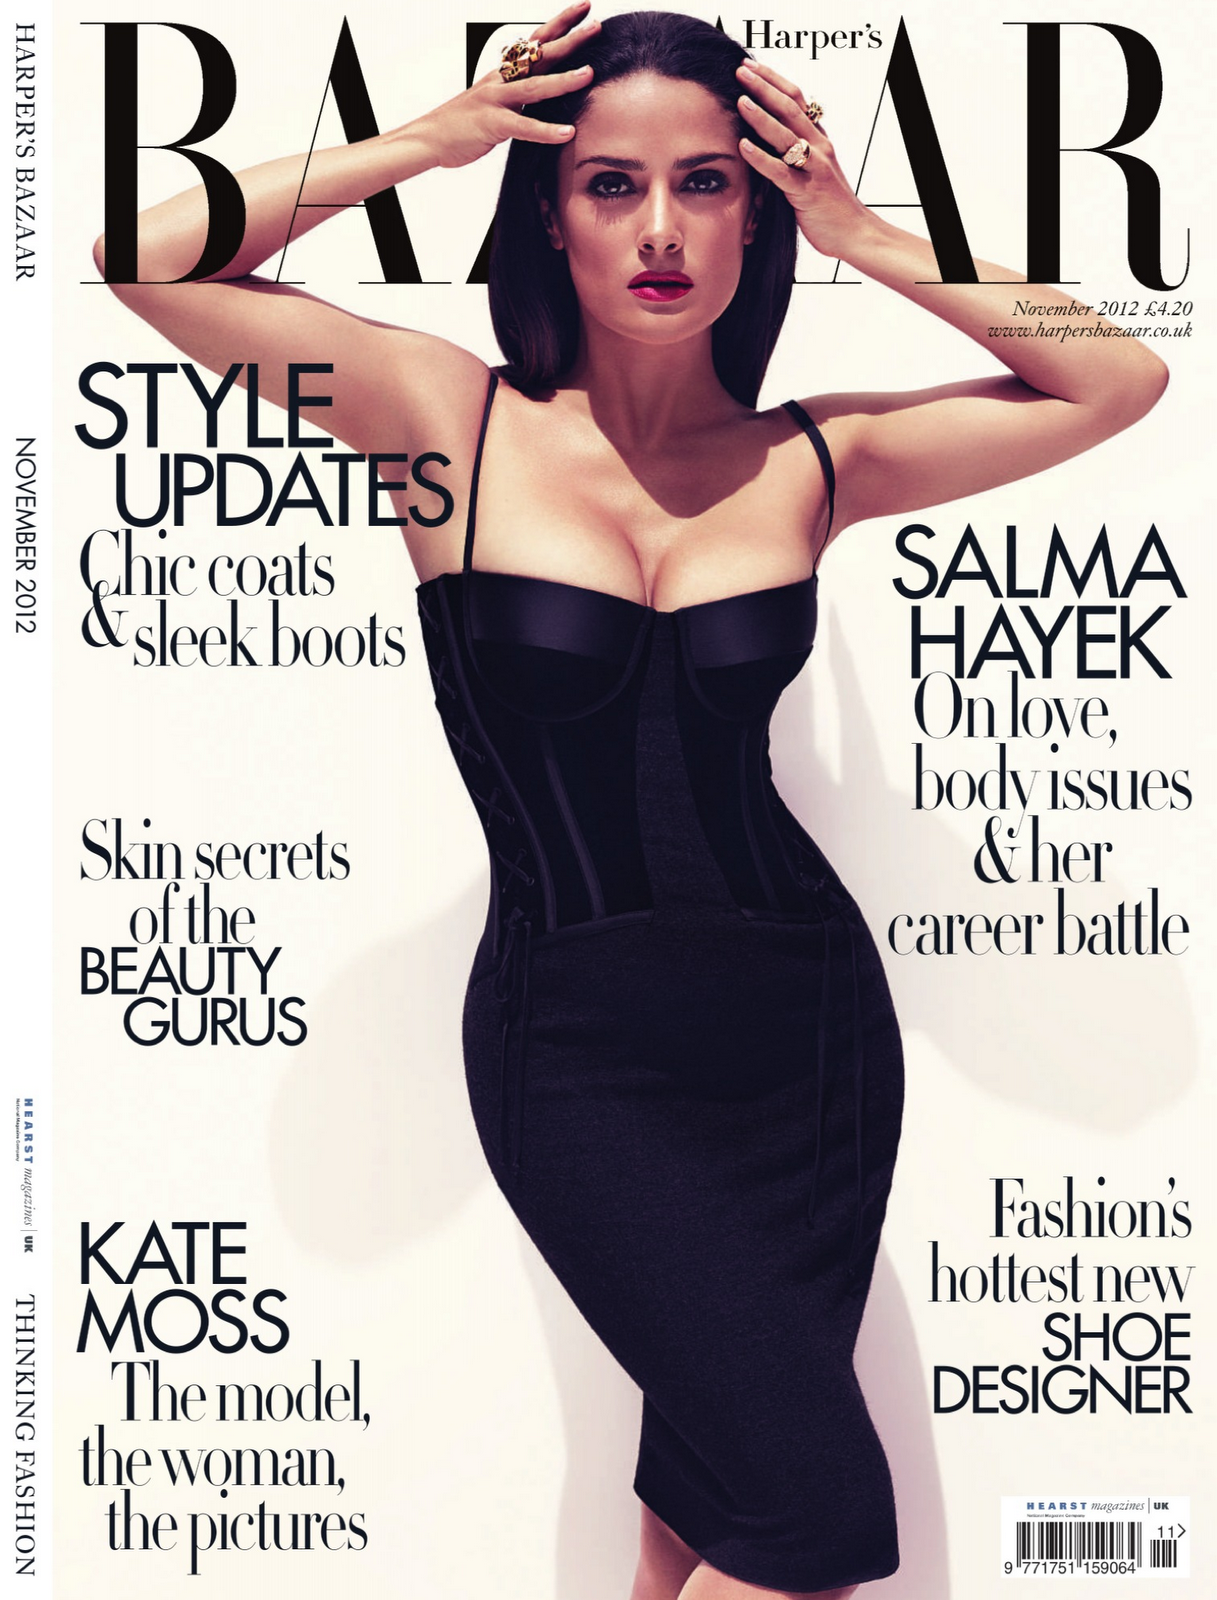 Salma Hayek Harpers Bazaar, November 2012 nude (57 photos), Bikini Celebrites pics